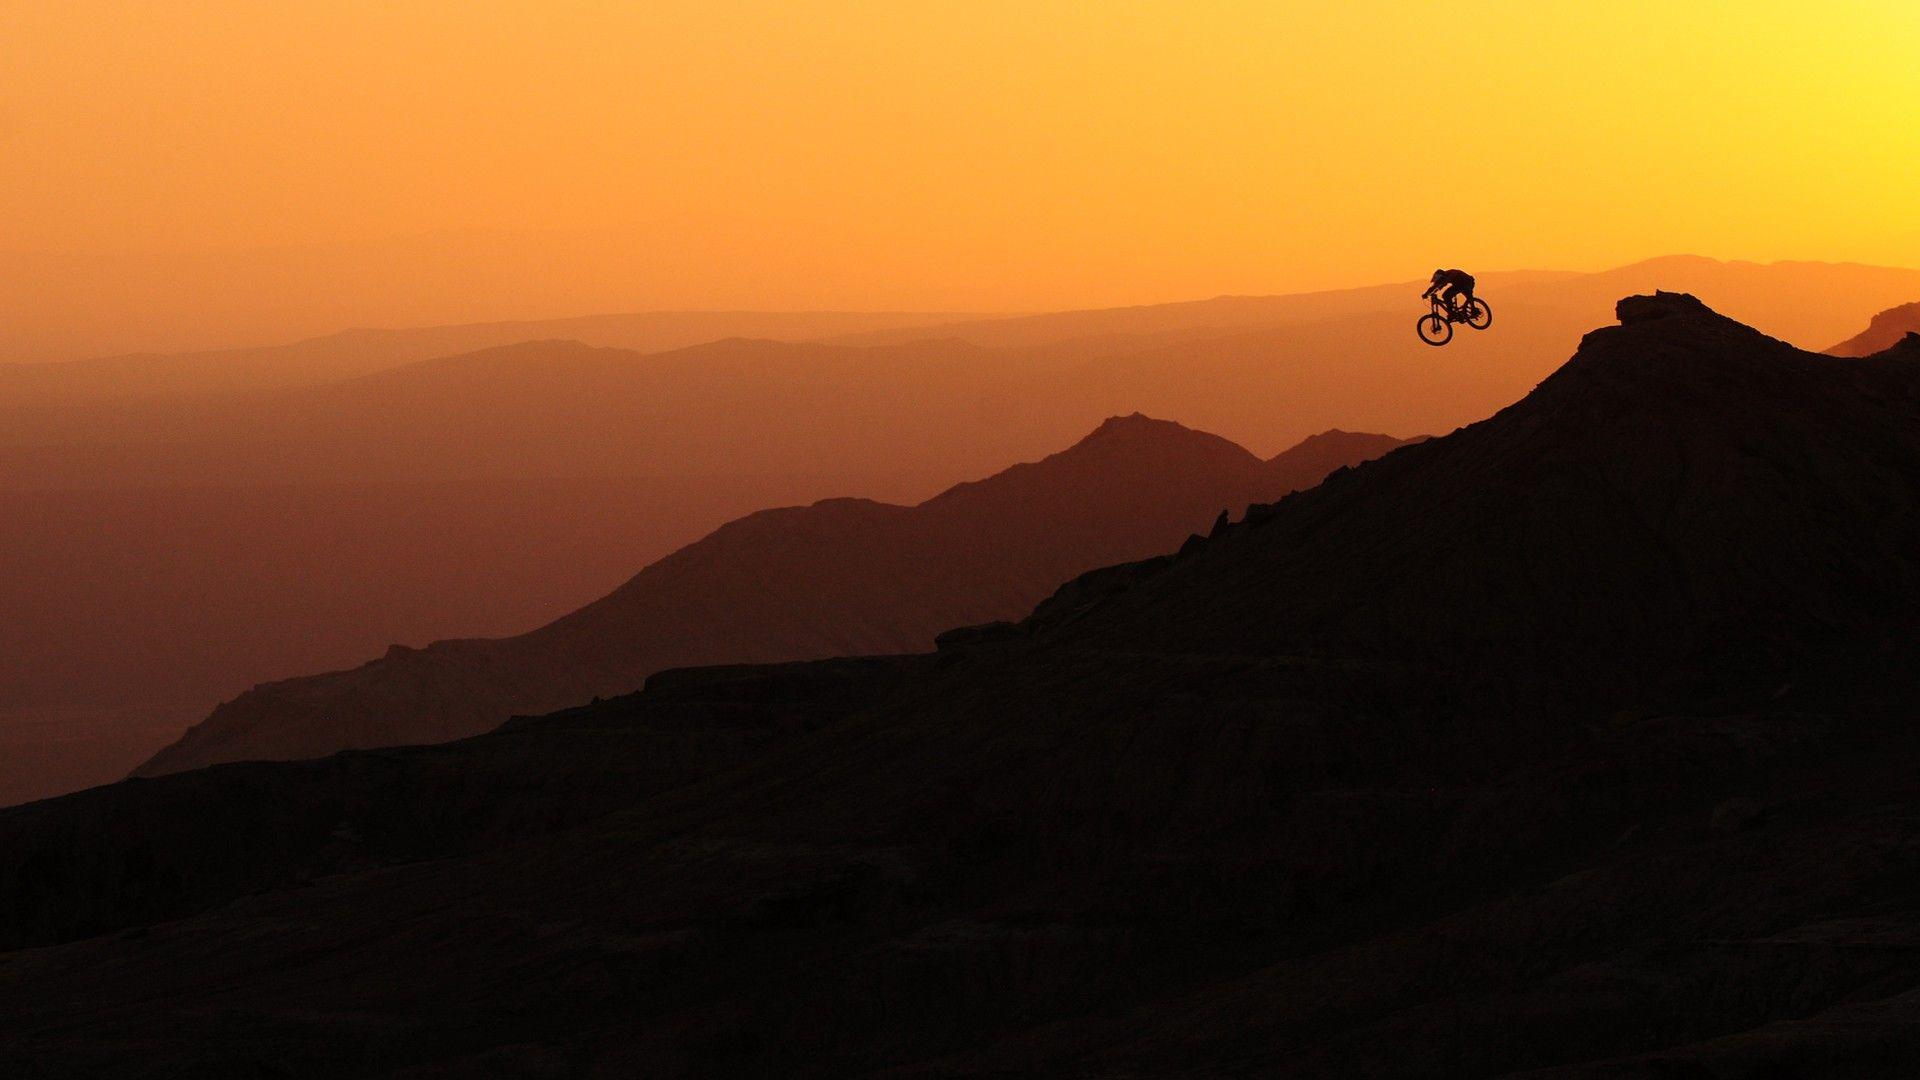 Downhill Bike Wide Wallpaper Free Download HD Wallpapers